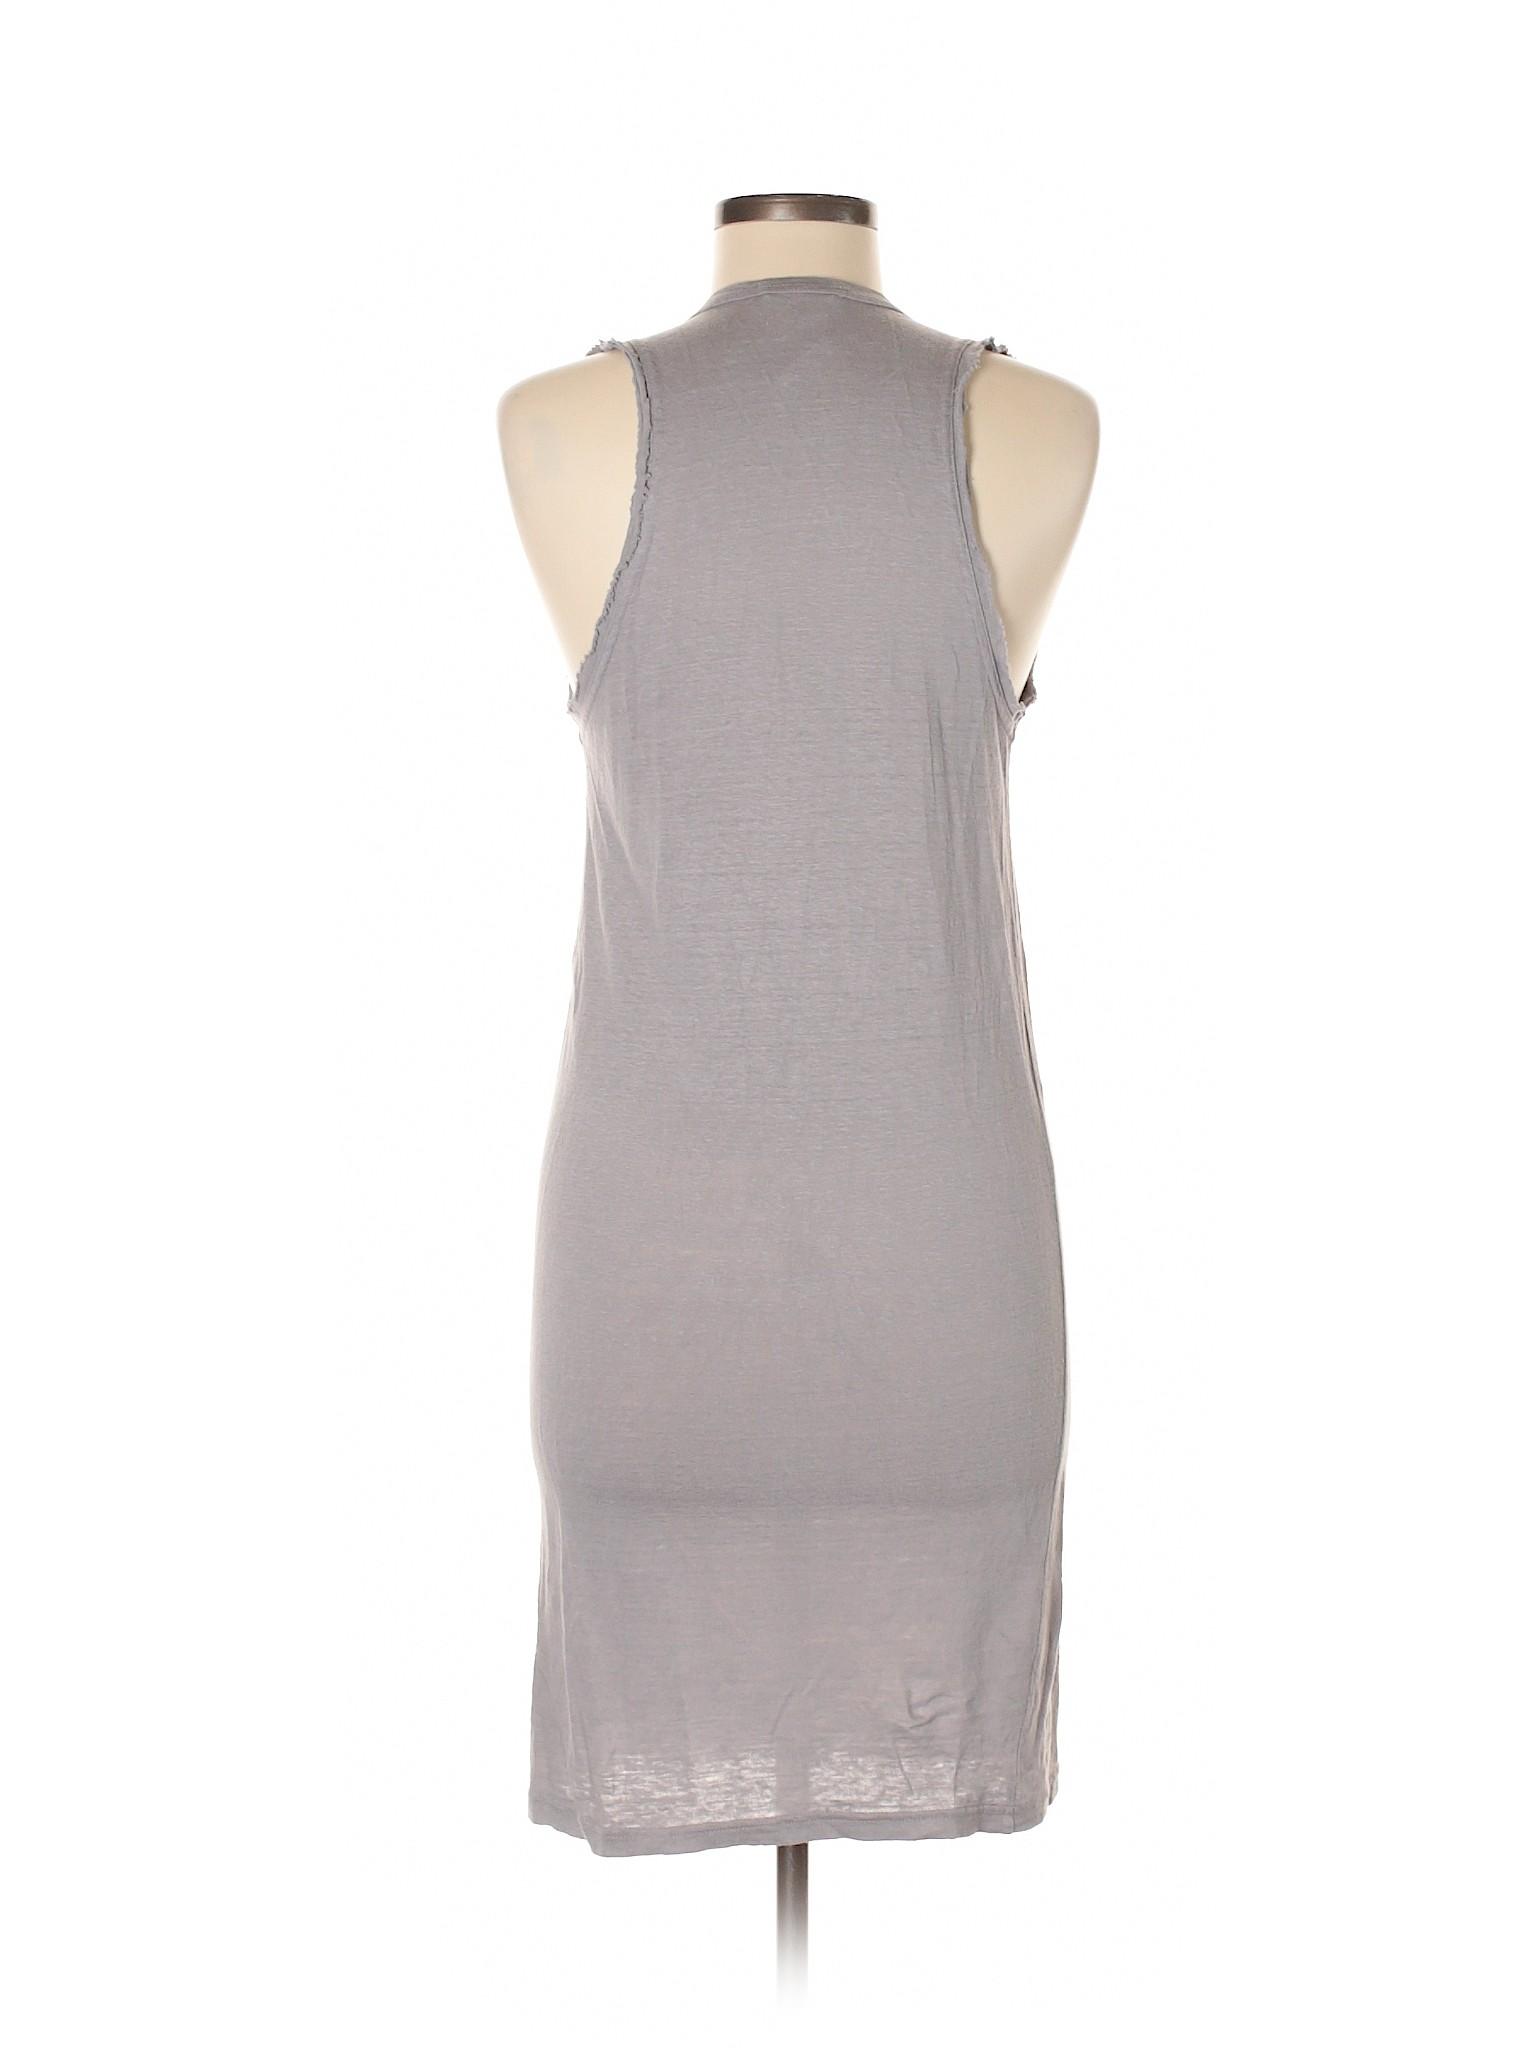 Marant Isabel Dress Casual Boutique Étoile winter q0w7f64A